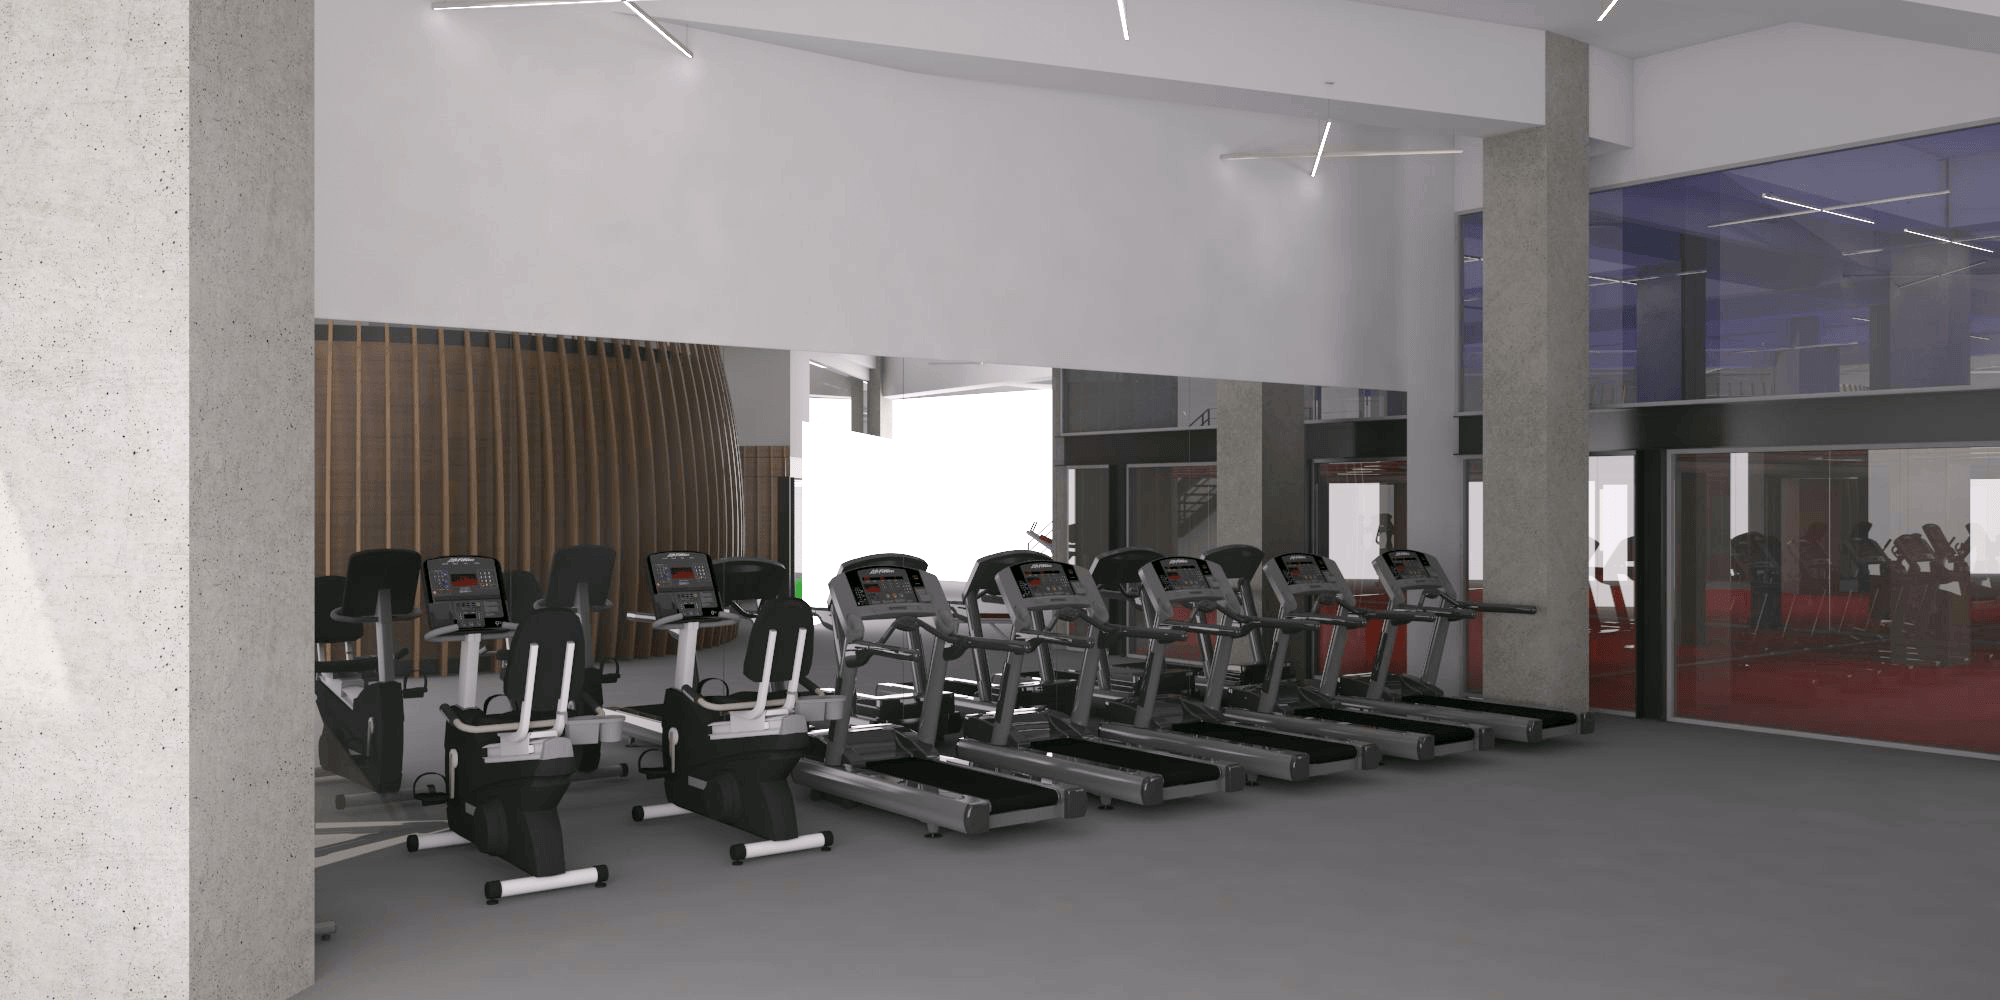 Pt. Indodesign Kreasi Mandiri Life Spa Fitness South Quarter South Jakarta South Jakarta Fitness-View-1   18071